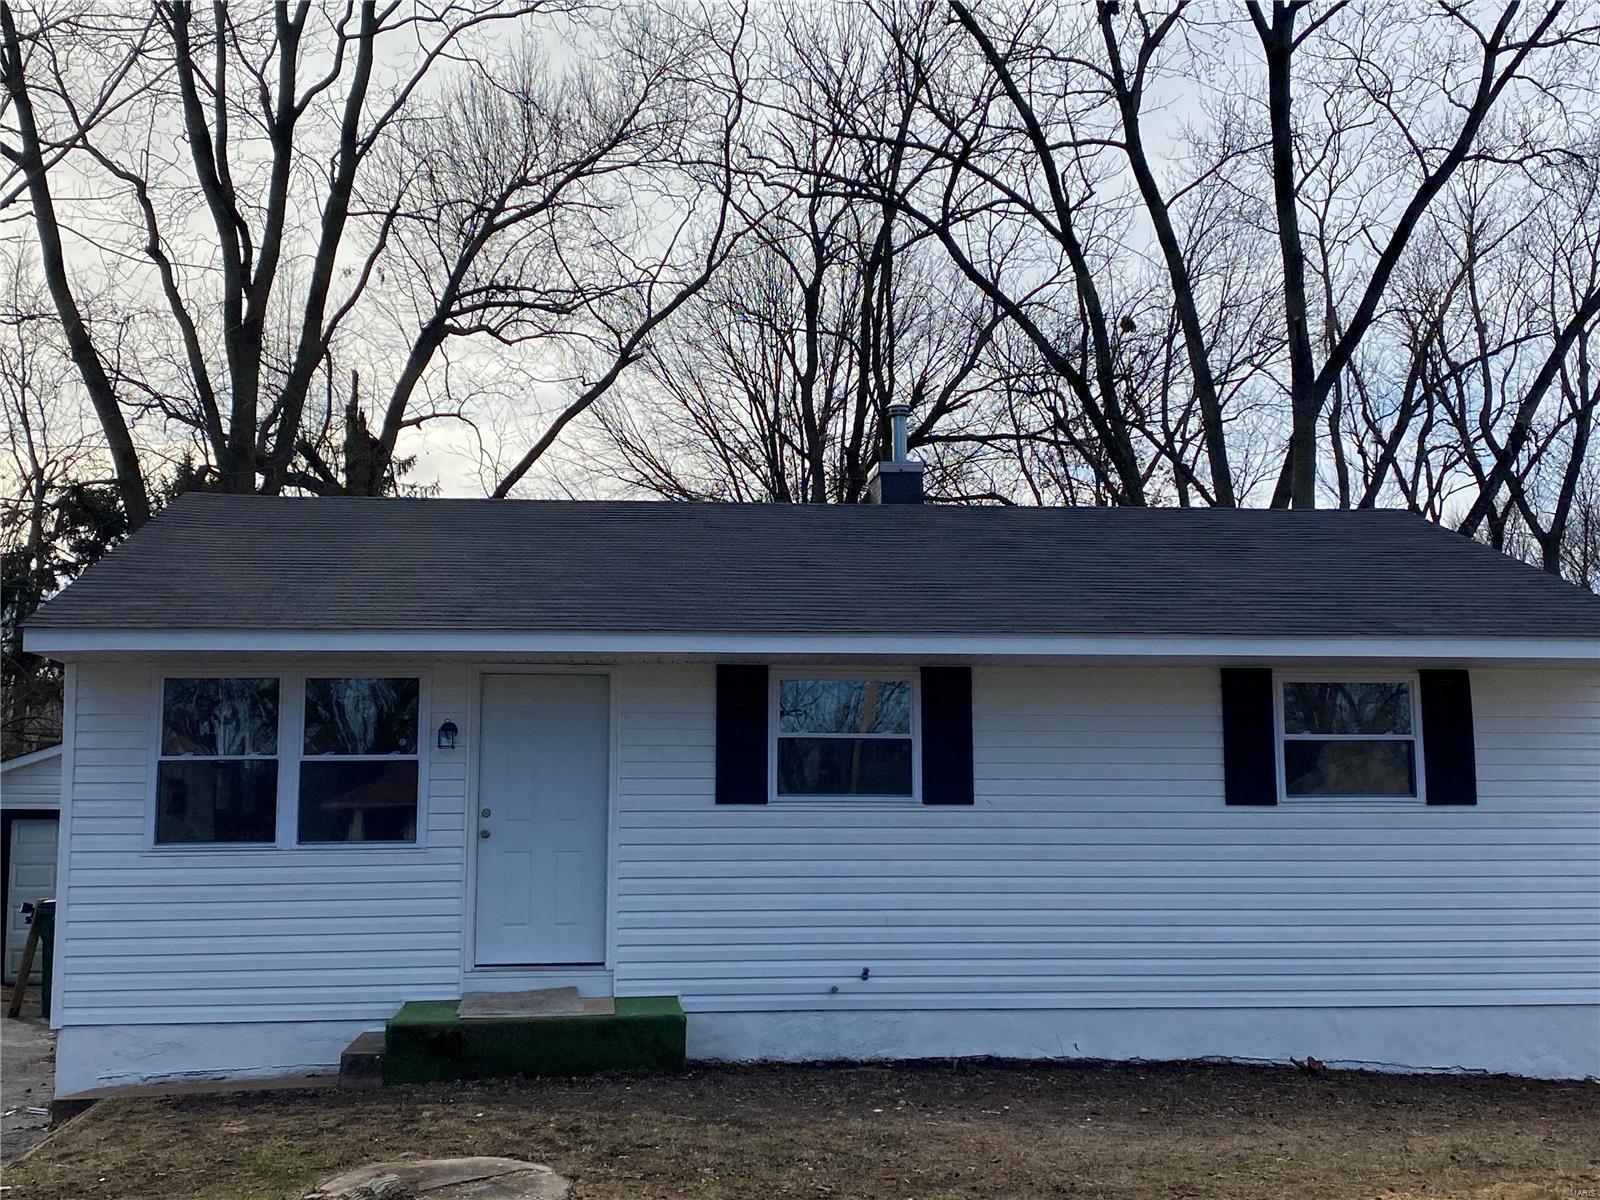 184 Brigadoon Property Photo - St Louis, MO real estate listing